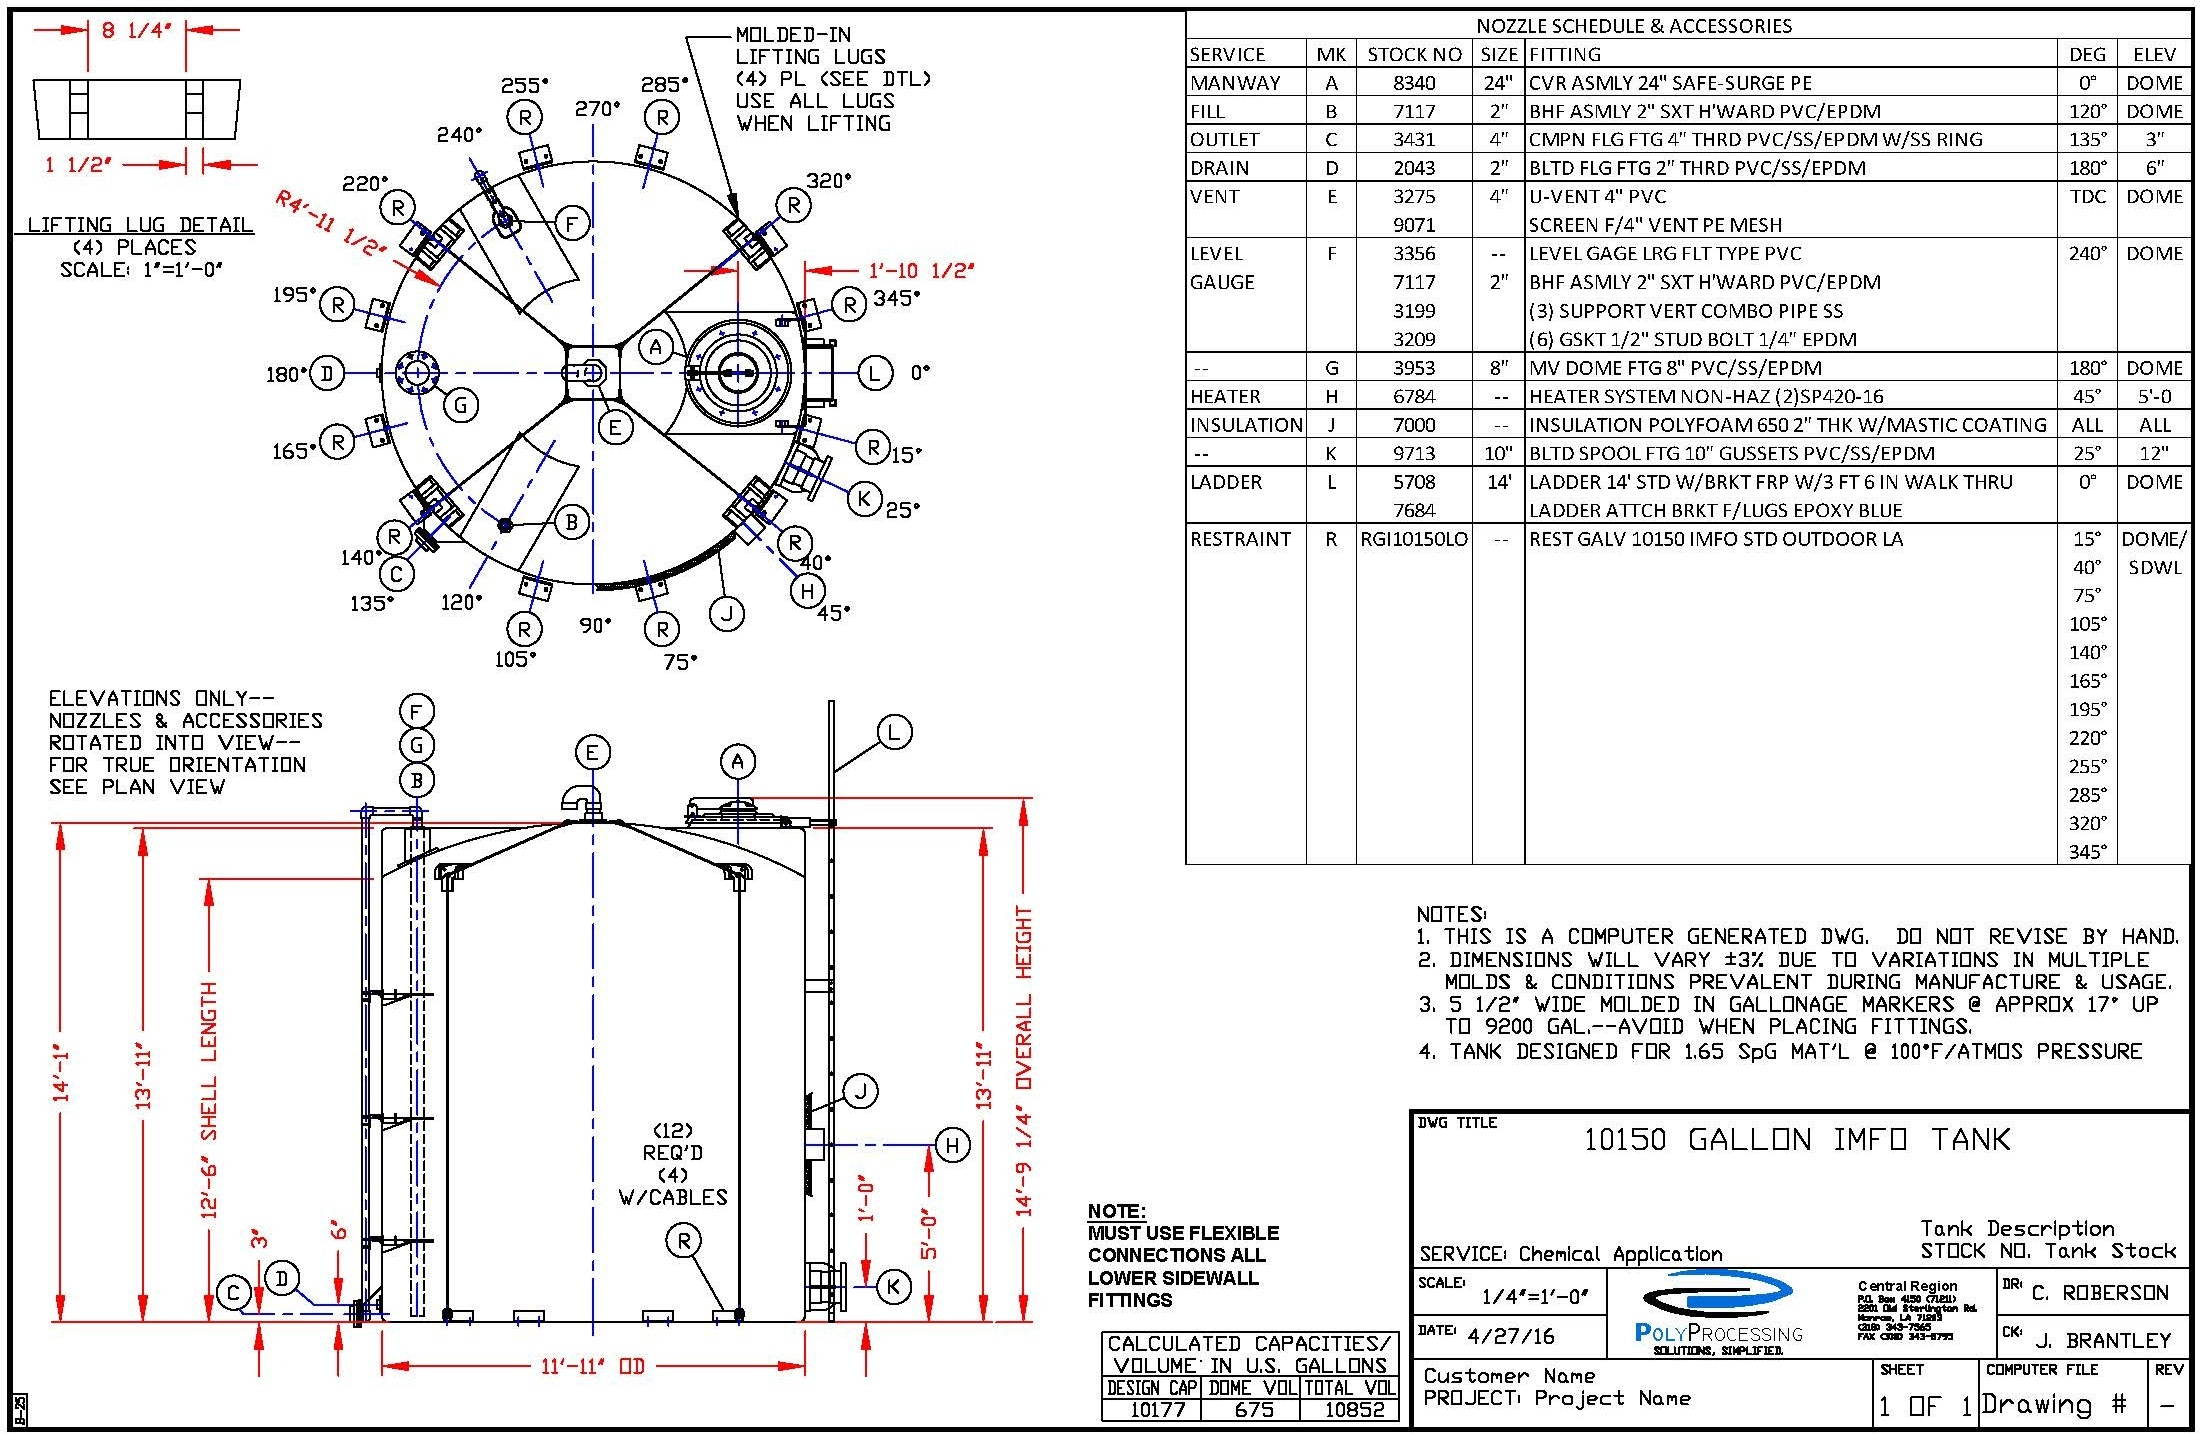 Custom_Drawing-830465-edited.jpg